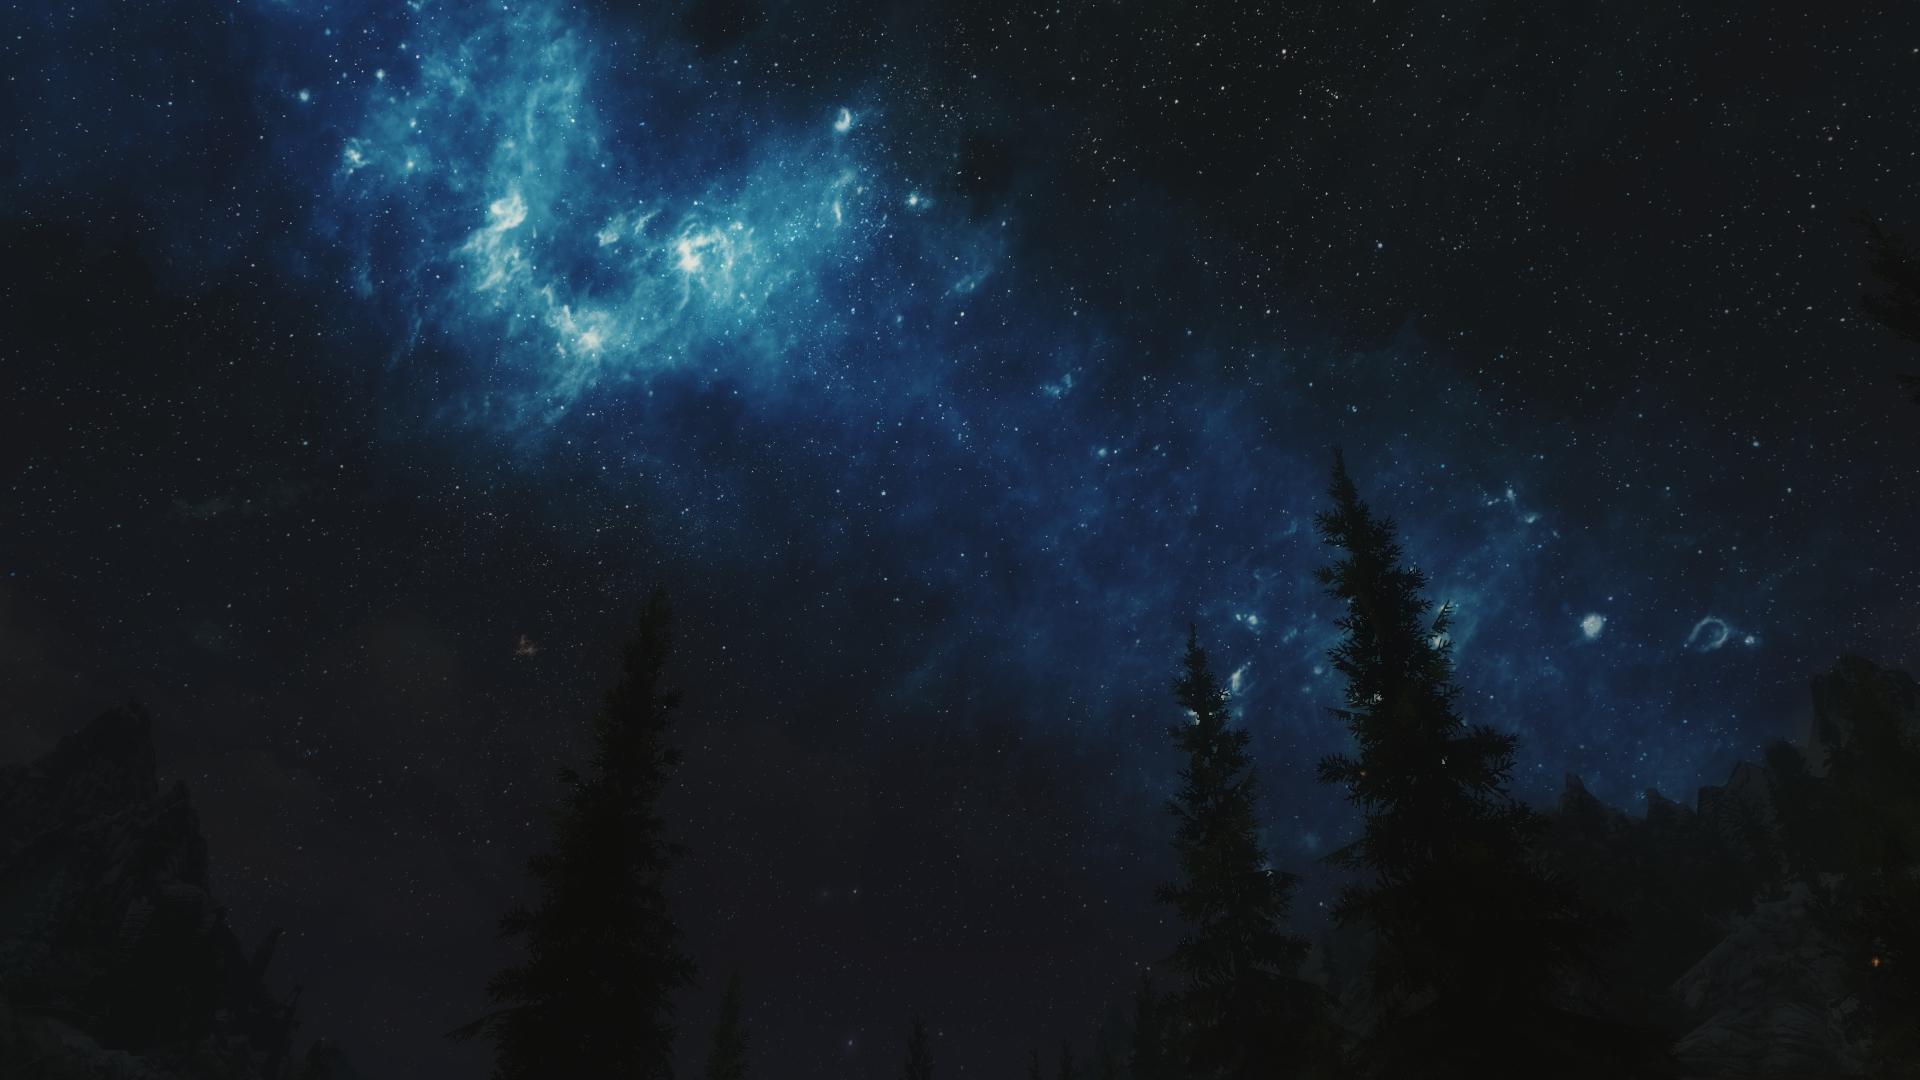 Night Sky wallpaper 16781 1920x1080